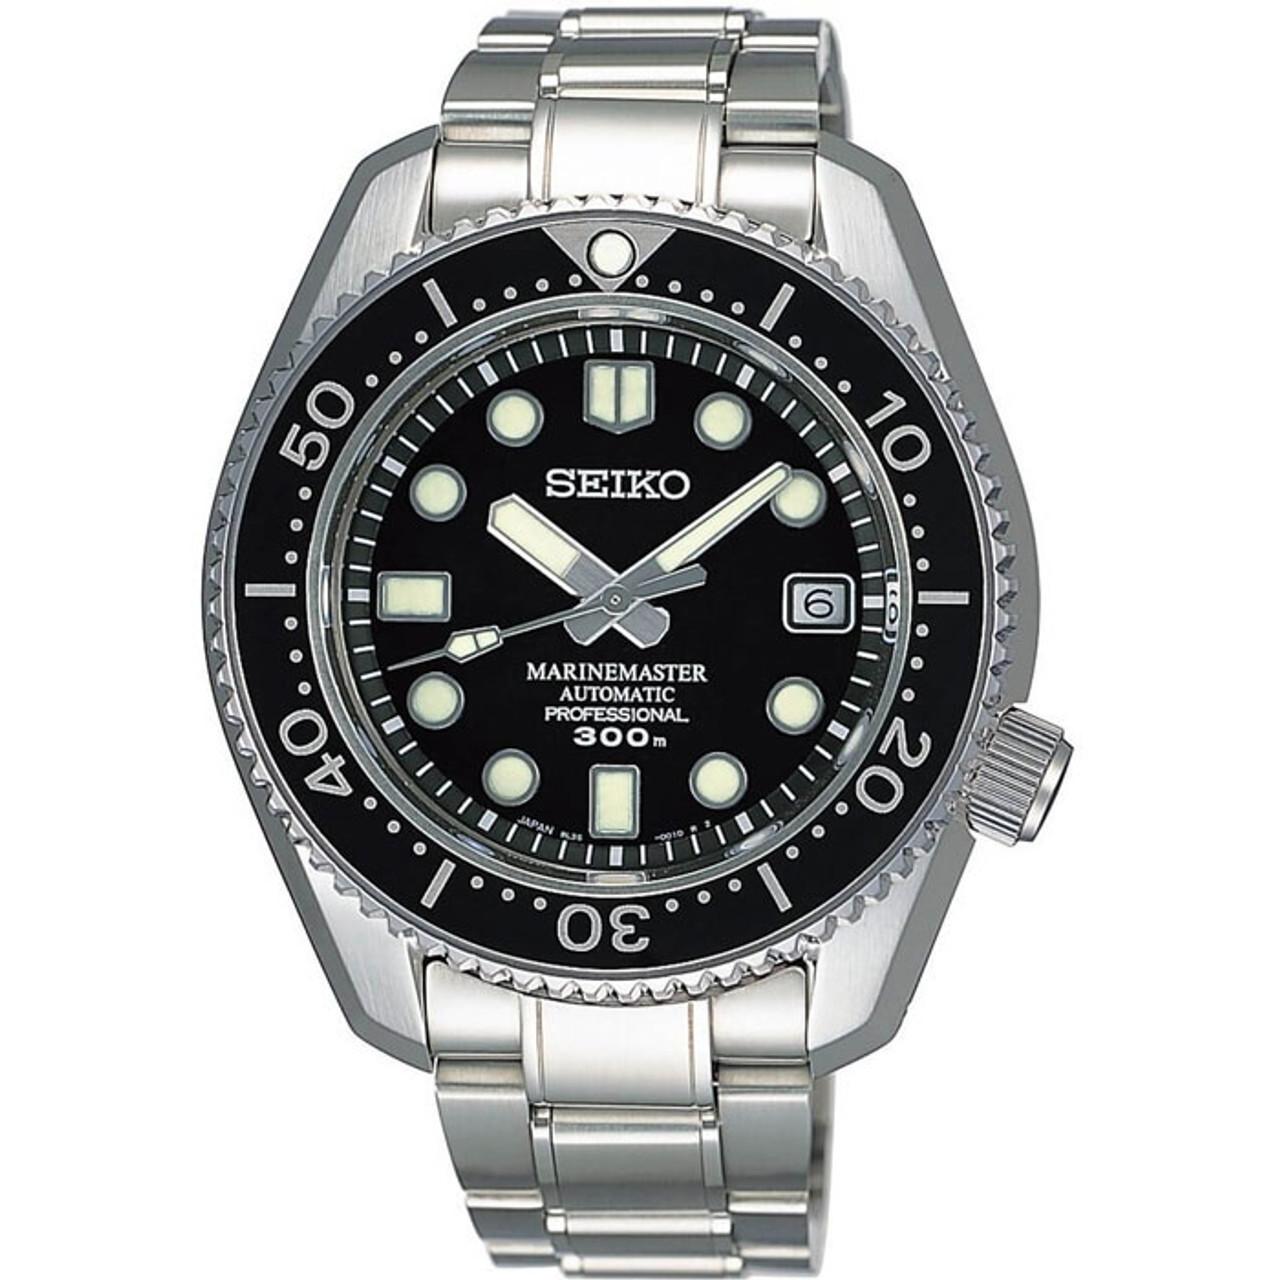 Seiko Prospex SBDX001 Marine Master Automatic